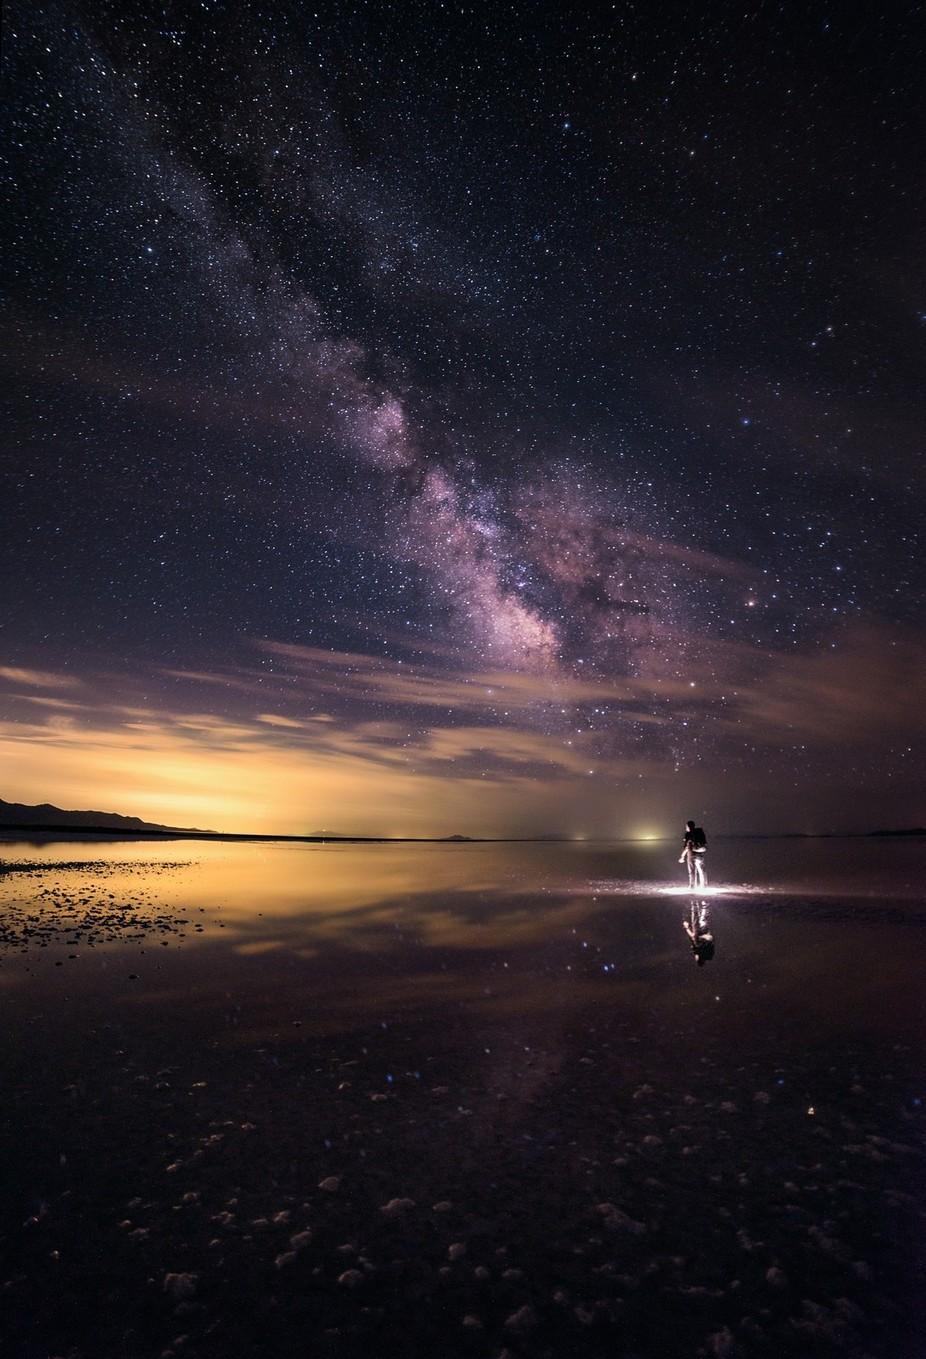 Walking On A Dream by prajitr - Creative Travels Photo Contest